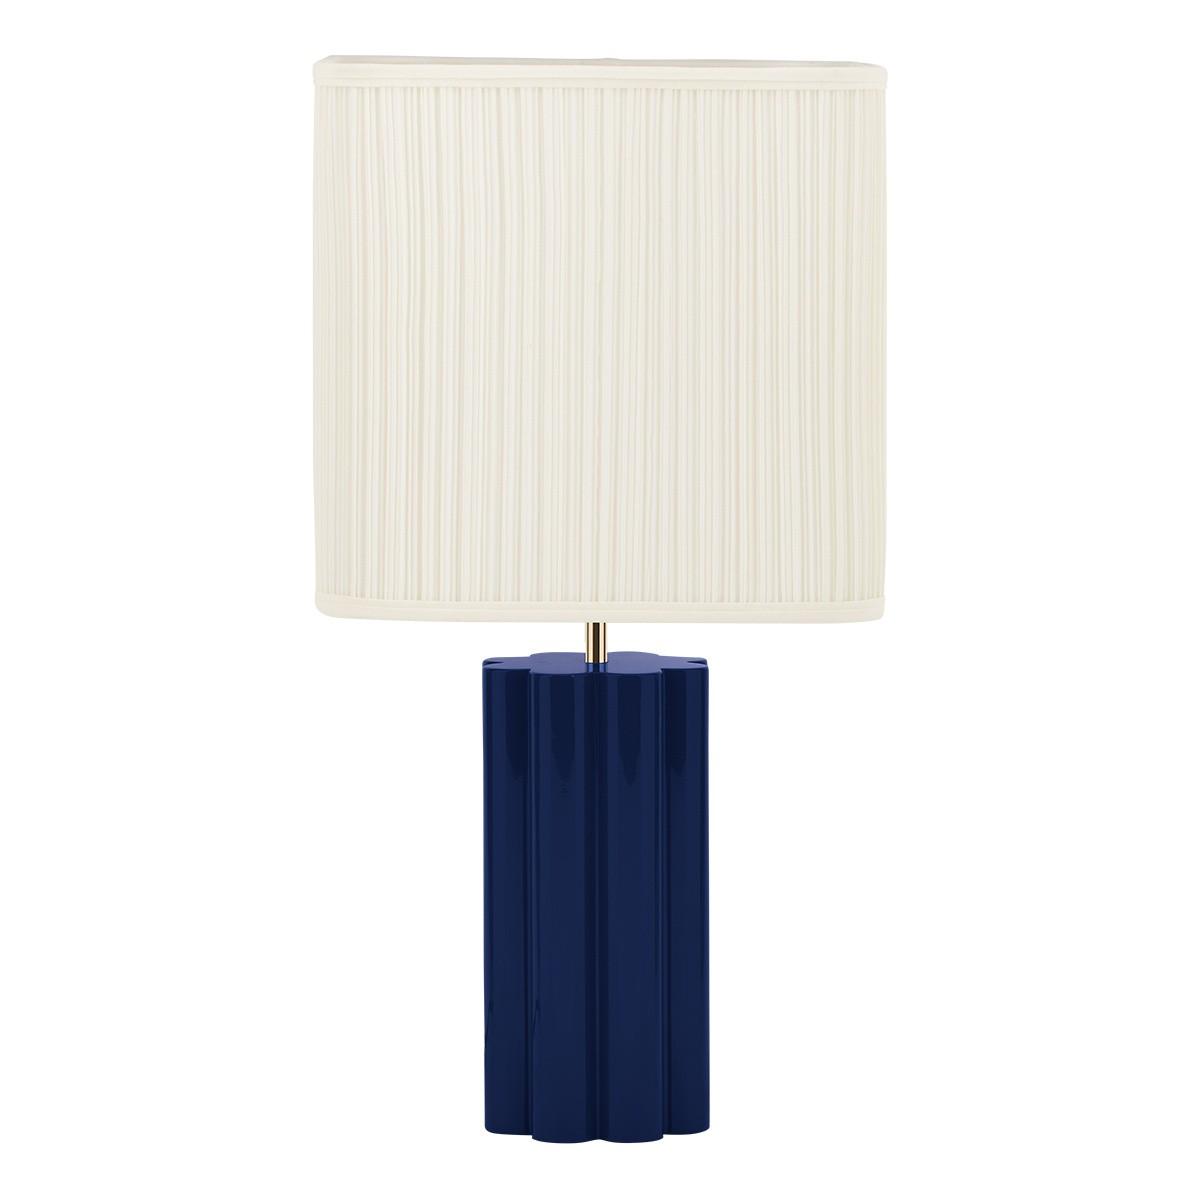 Lampe à poser Gioia bleue